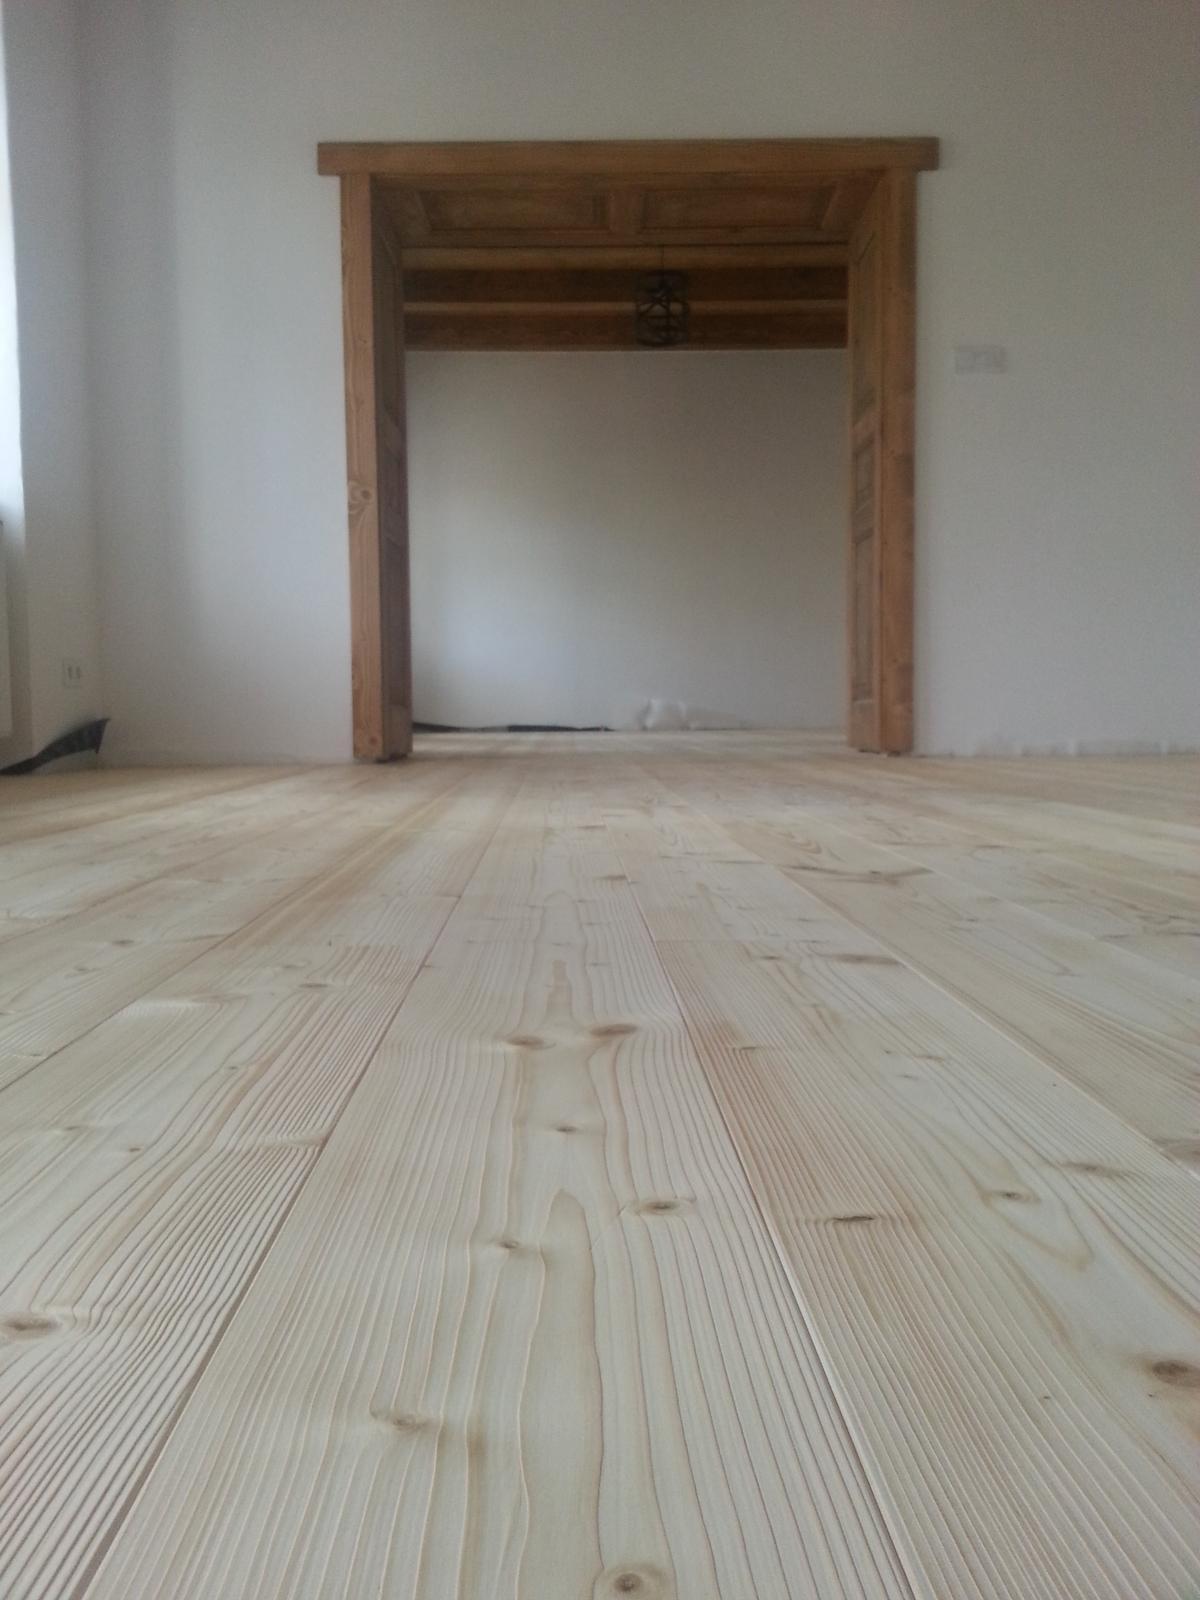 Rekonstrukcia  domu z 18- teho storocia - podlaha dokoncena:)